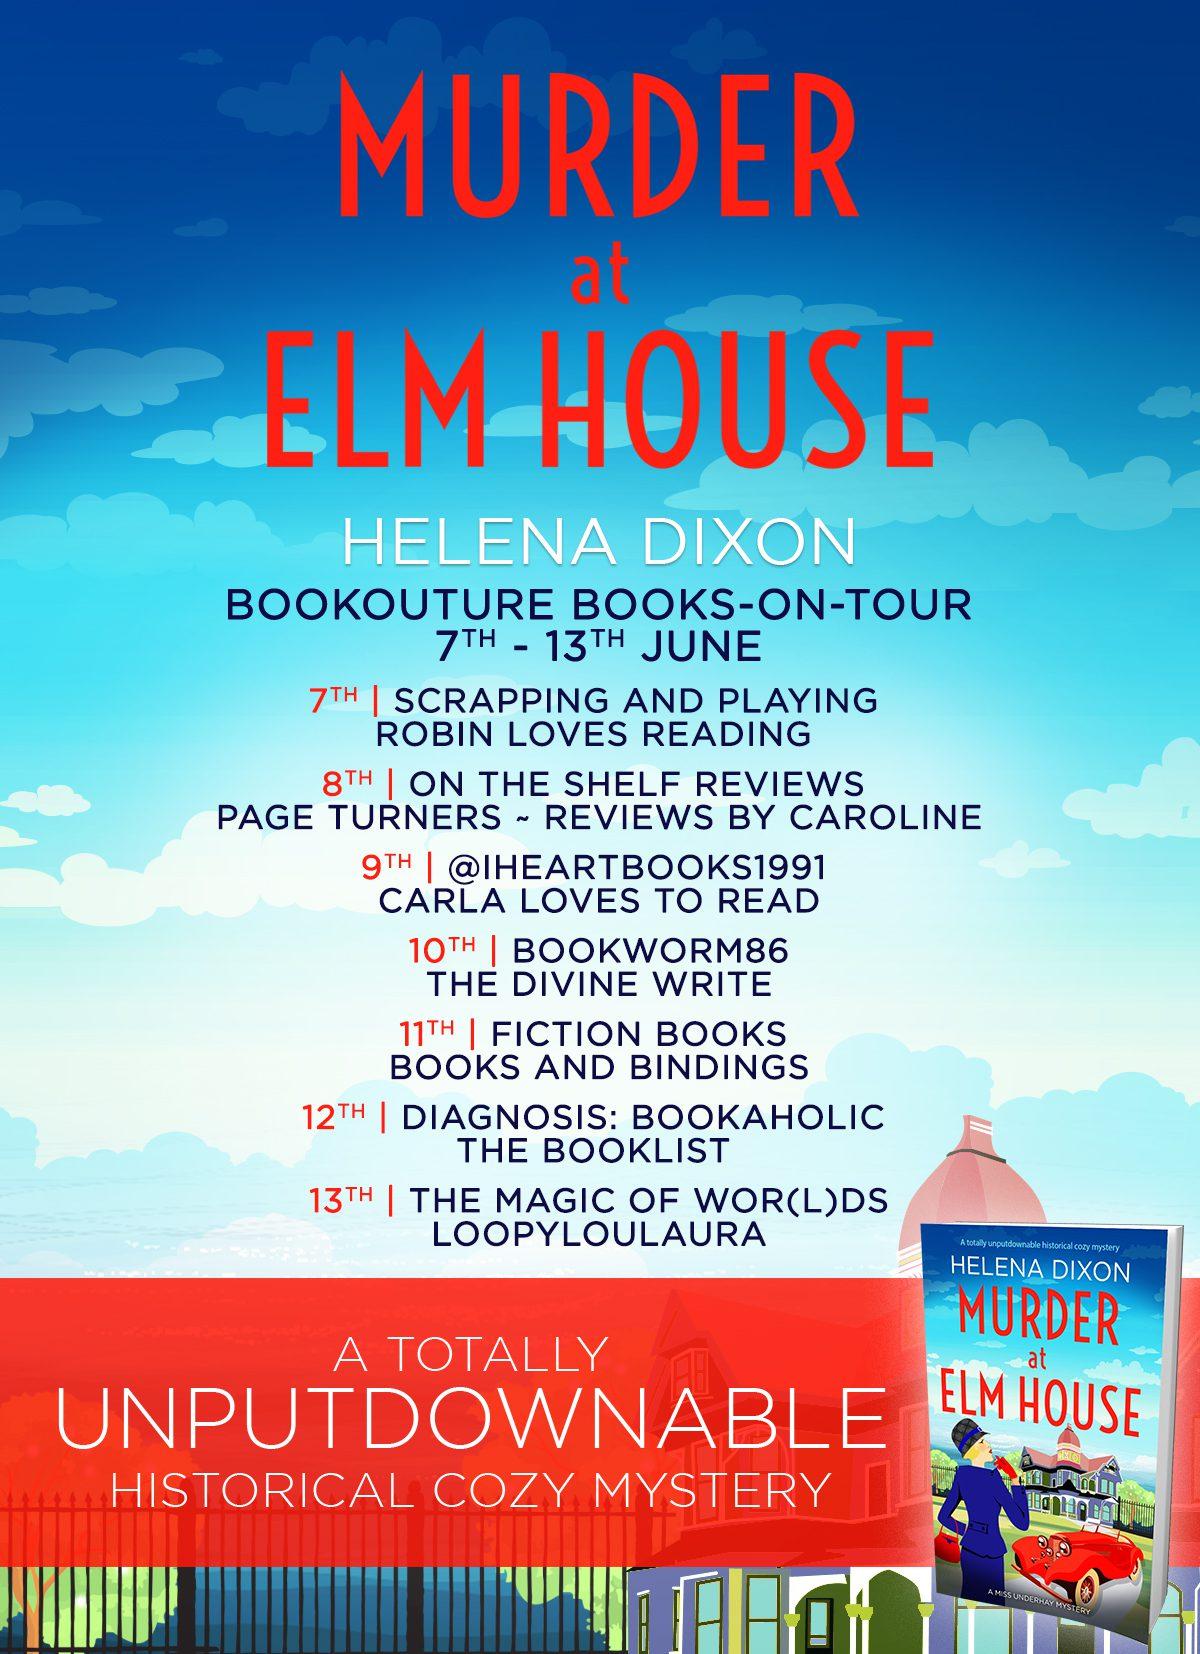 Murder at Elm House blog tour banner